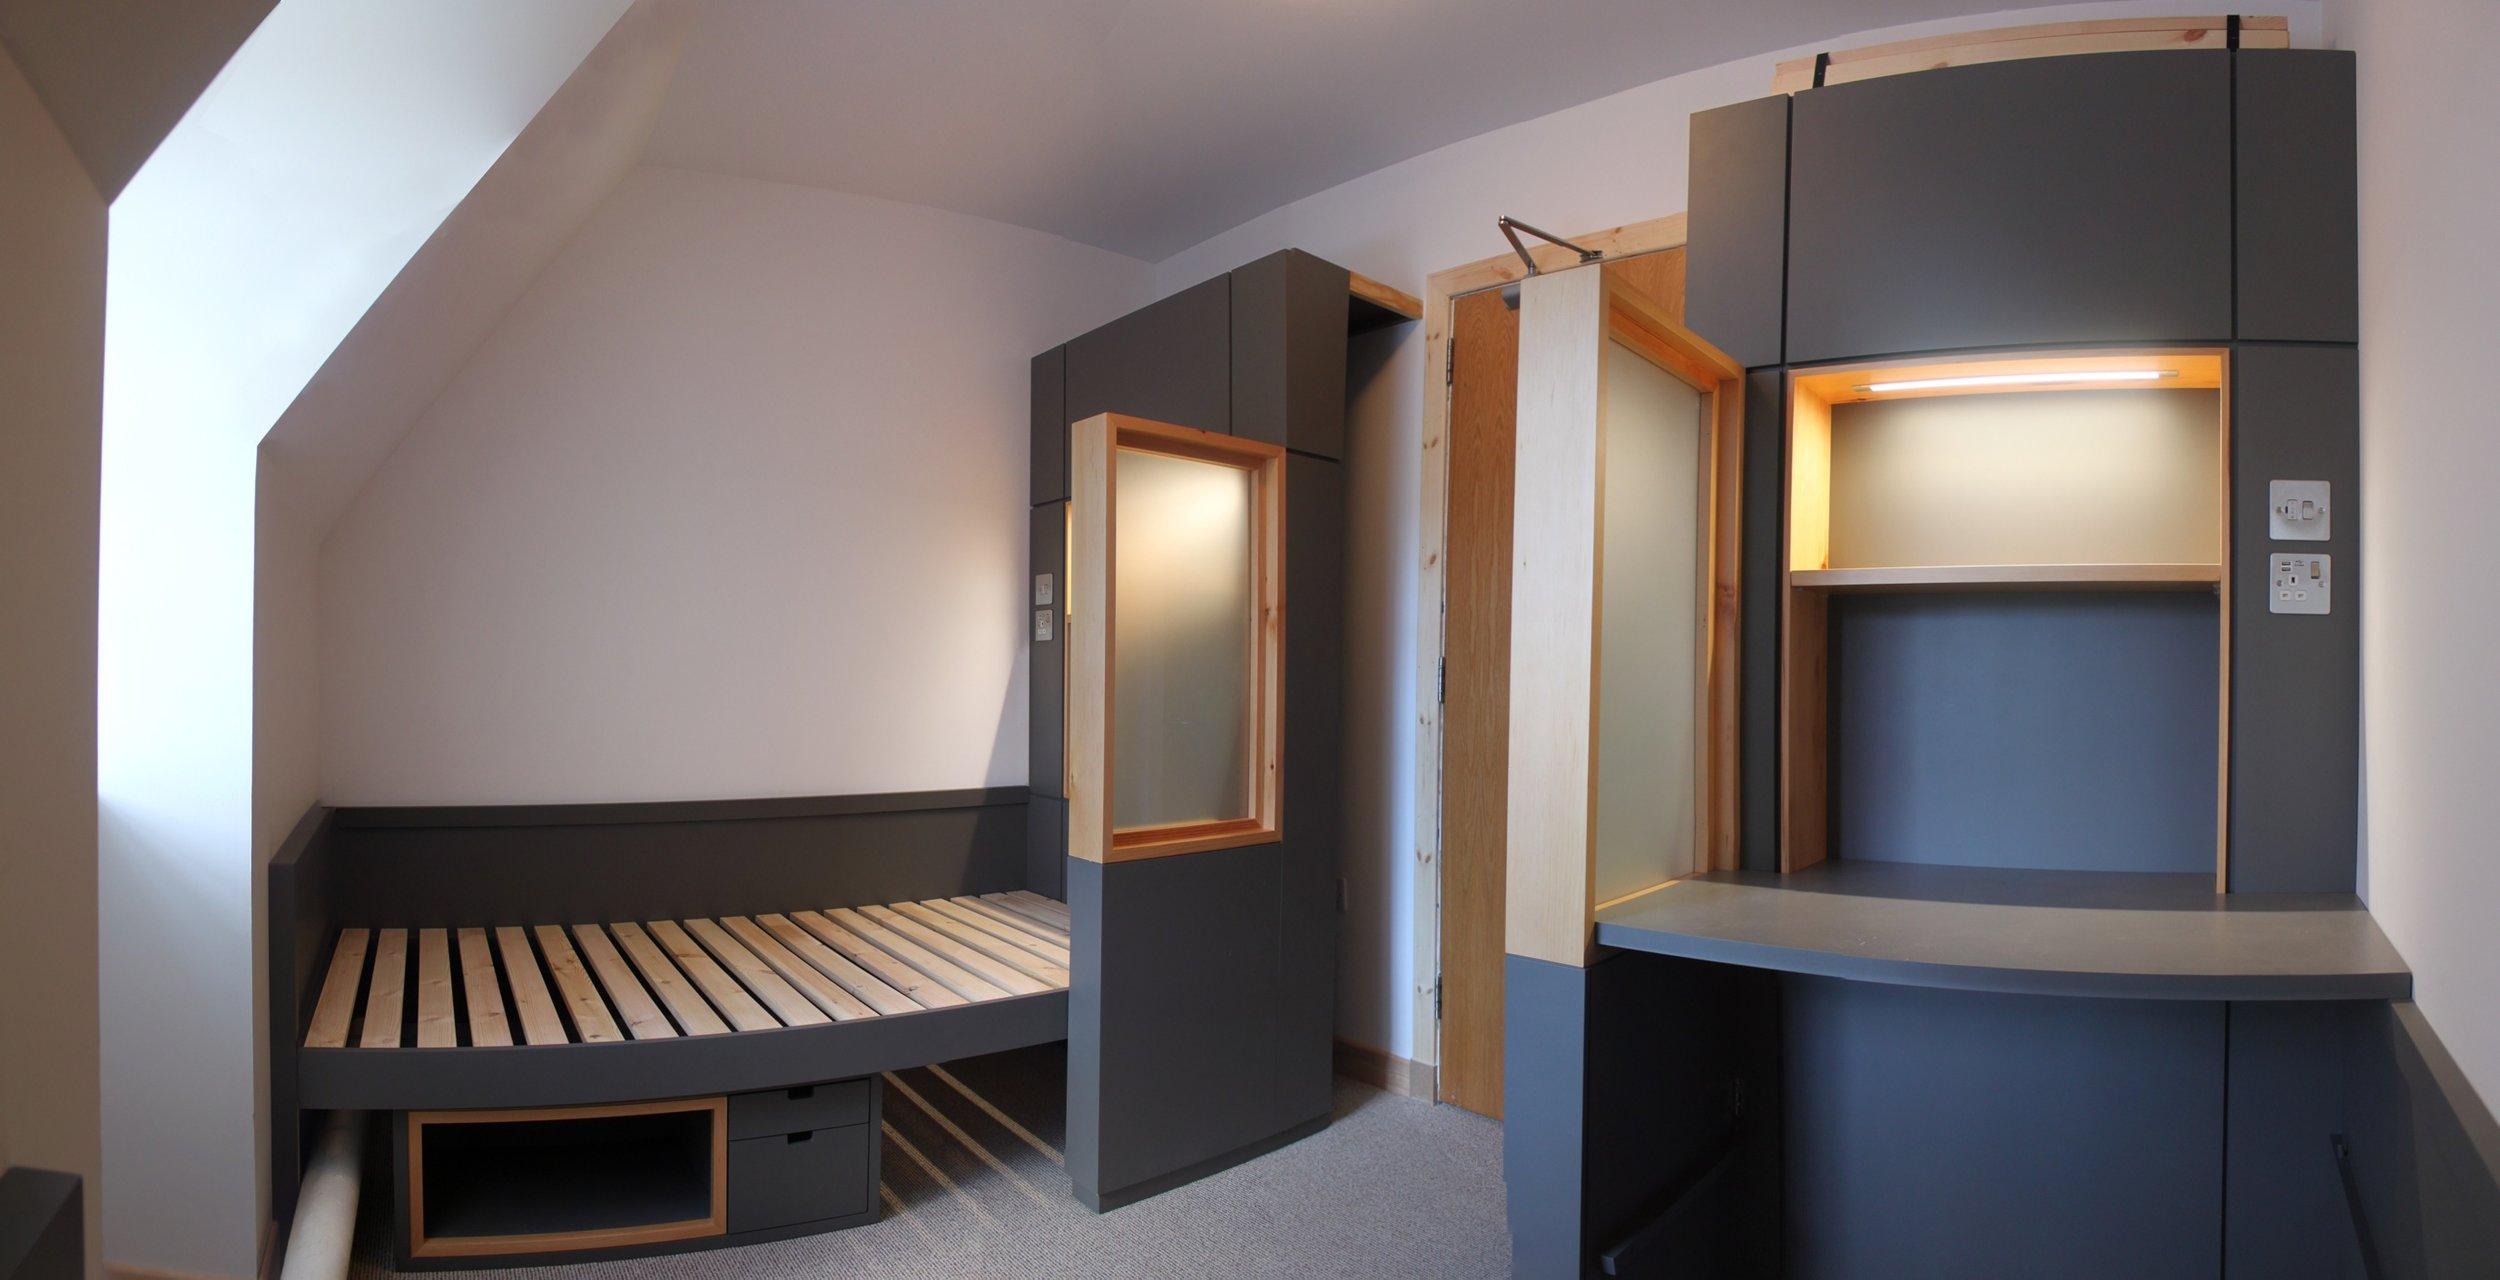 118PB Prototype bedroom 1.jpg